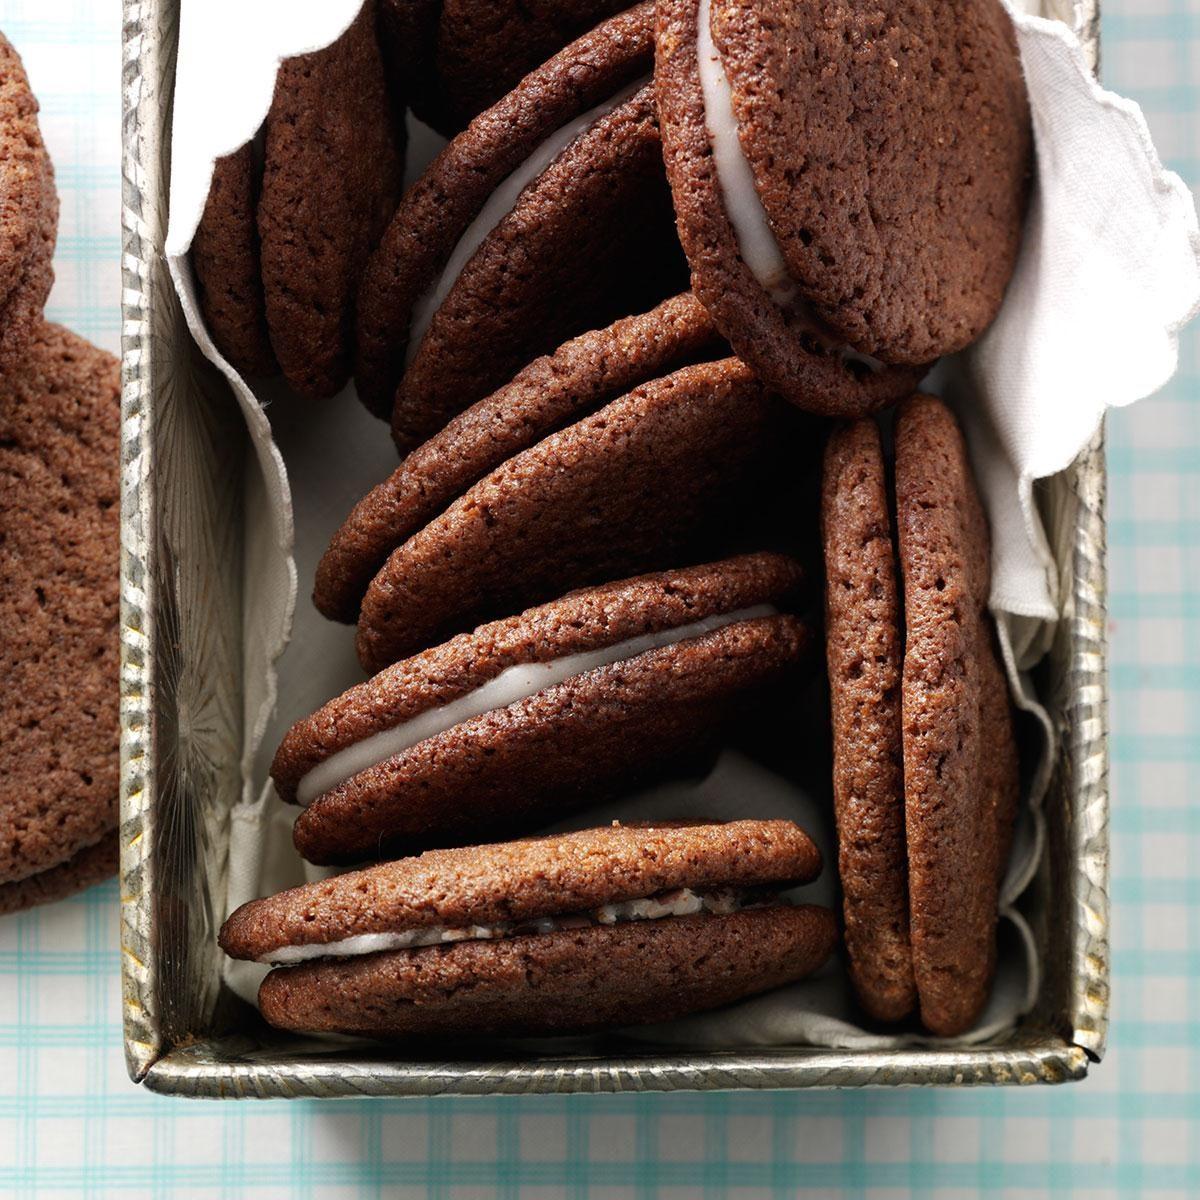 Contest-Winning Chocolate Mint Cookies